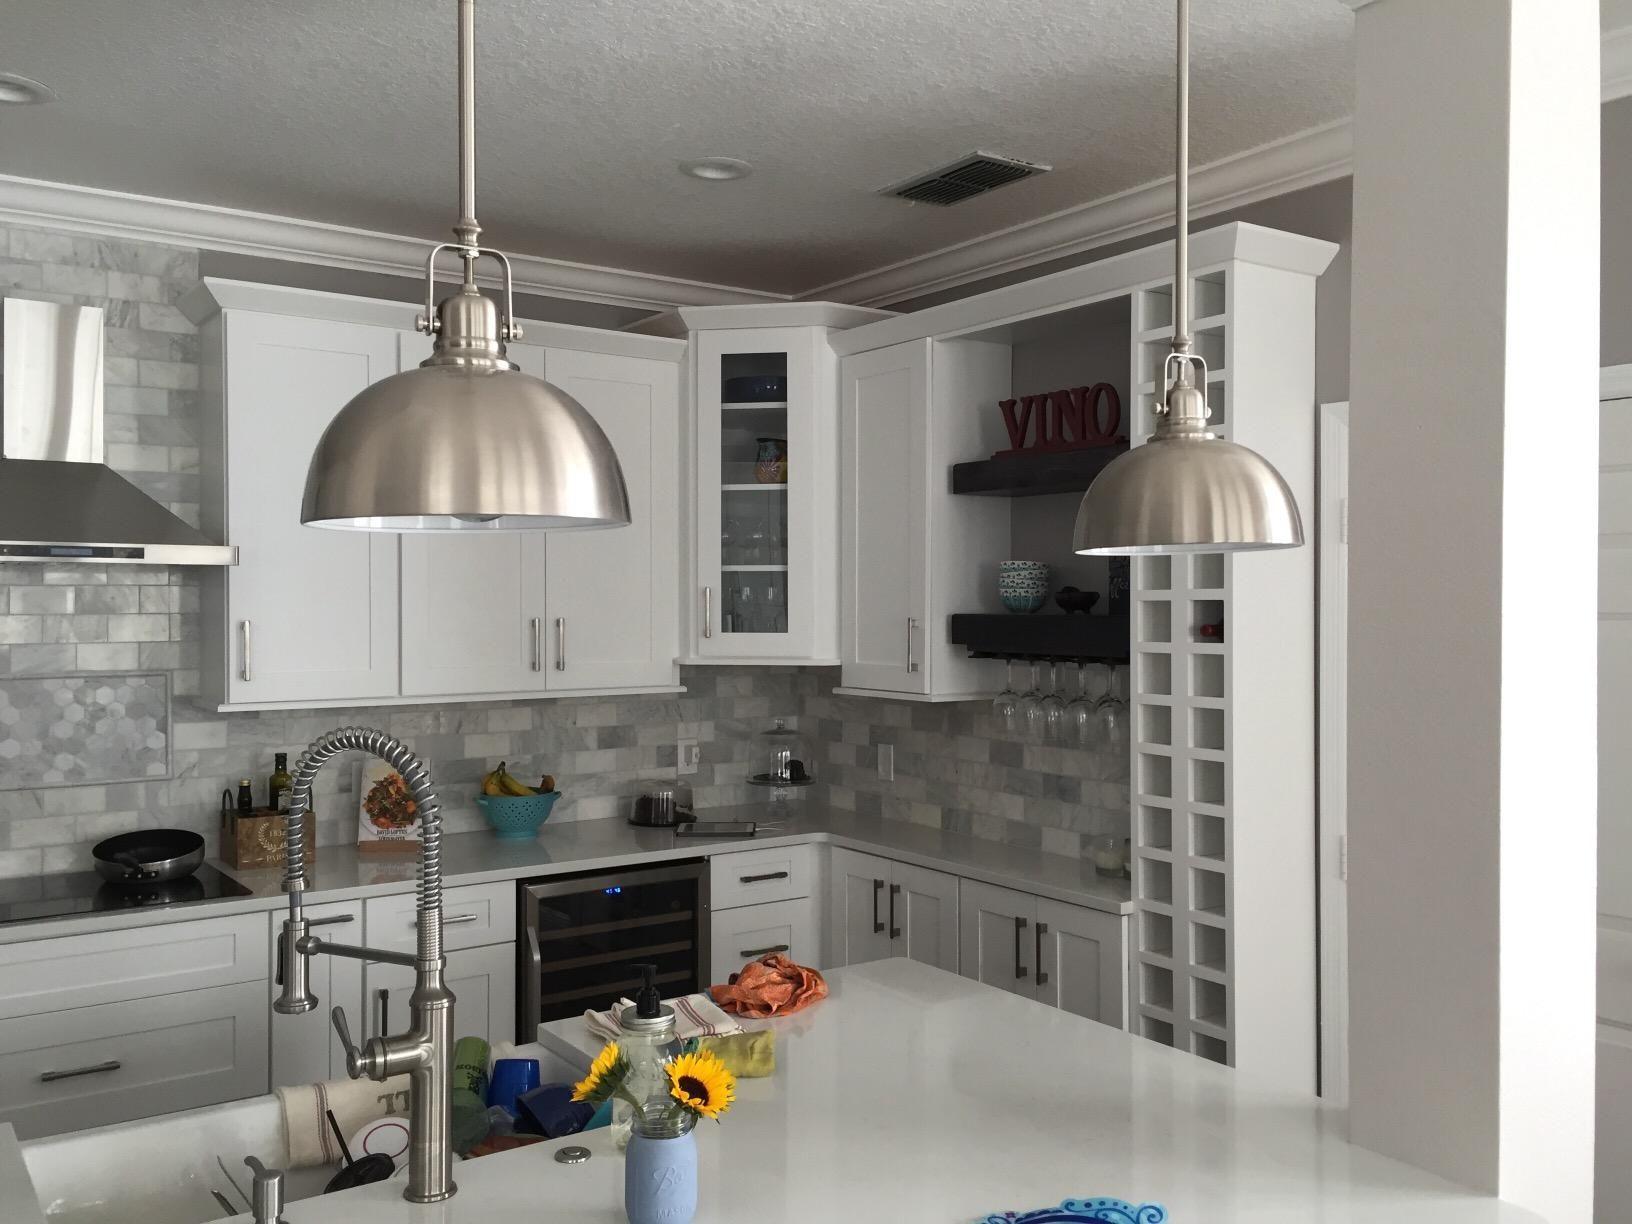 Bennington 2 Pack Of Ipl222b01 Bn Gd Hudson 1 Light Mini Pendants With Brushed Nickel Metal Shades Kitchen Remodel Home Decor Styles New Kitchen